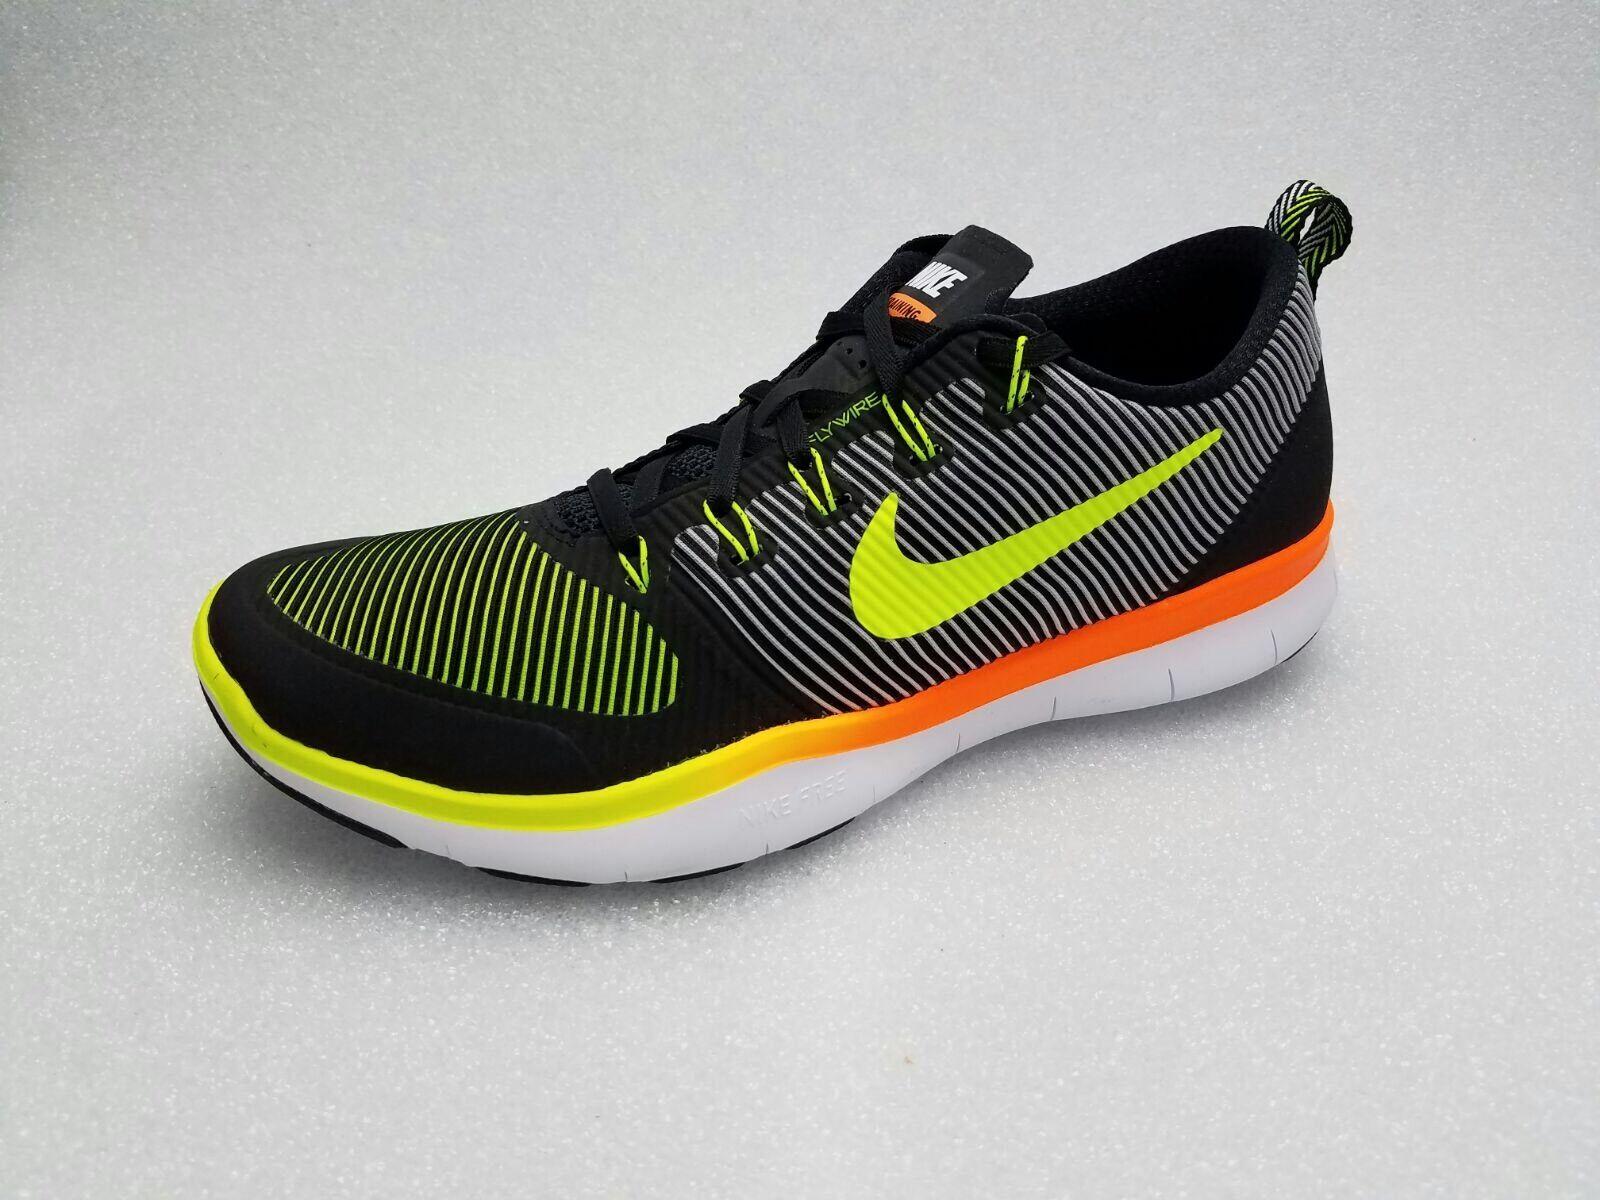 New Nike Free TR Versatility Sz 11 Multi Color Fast Free Shipping